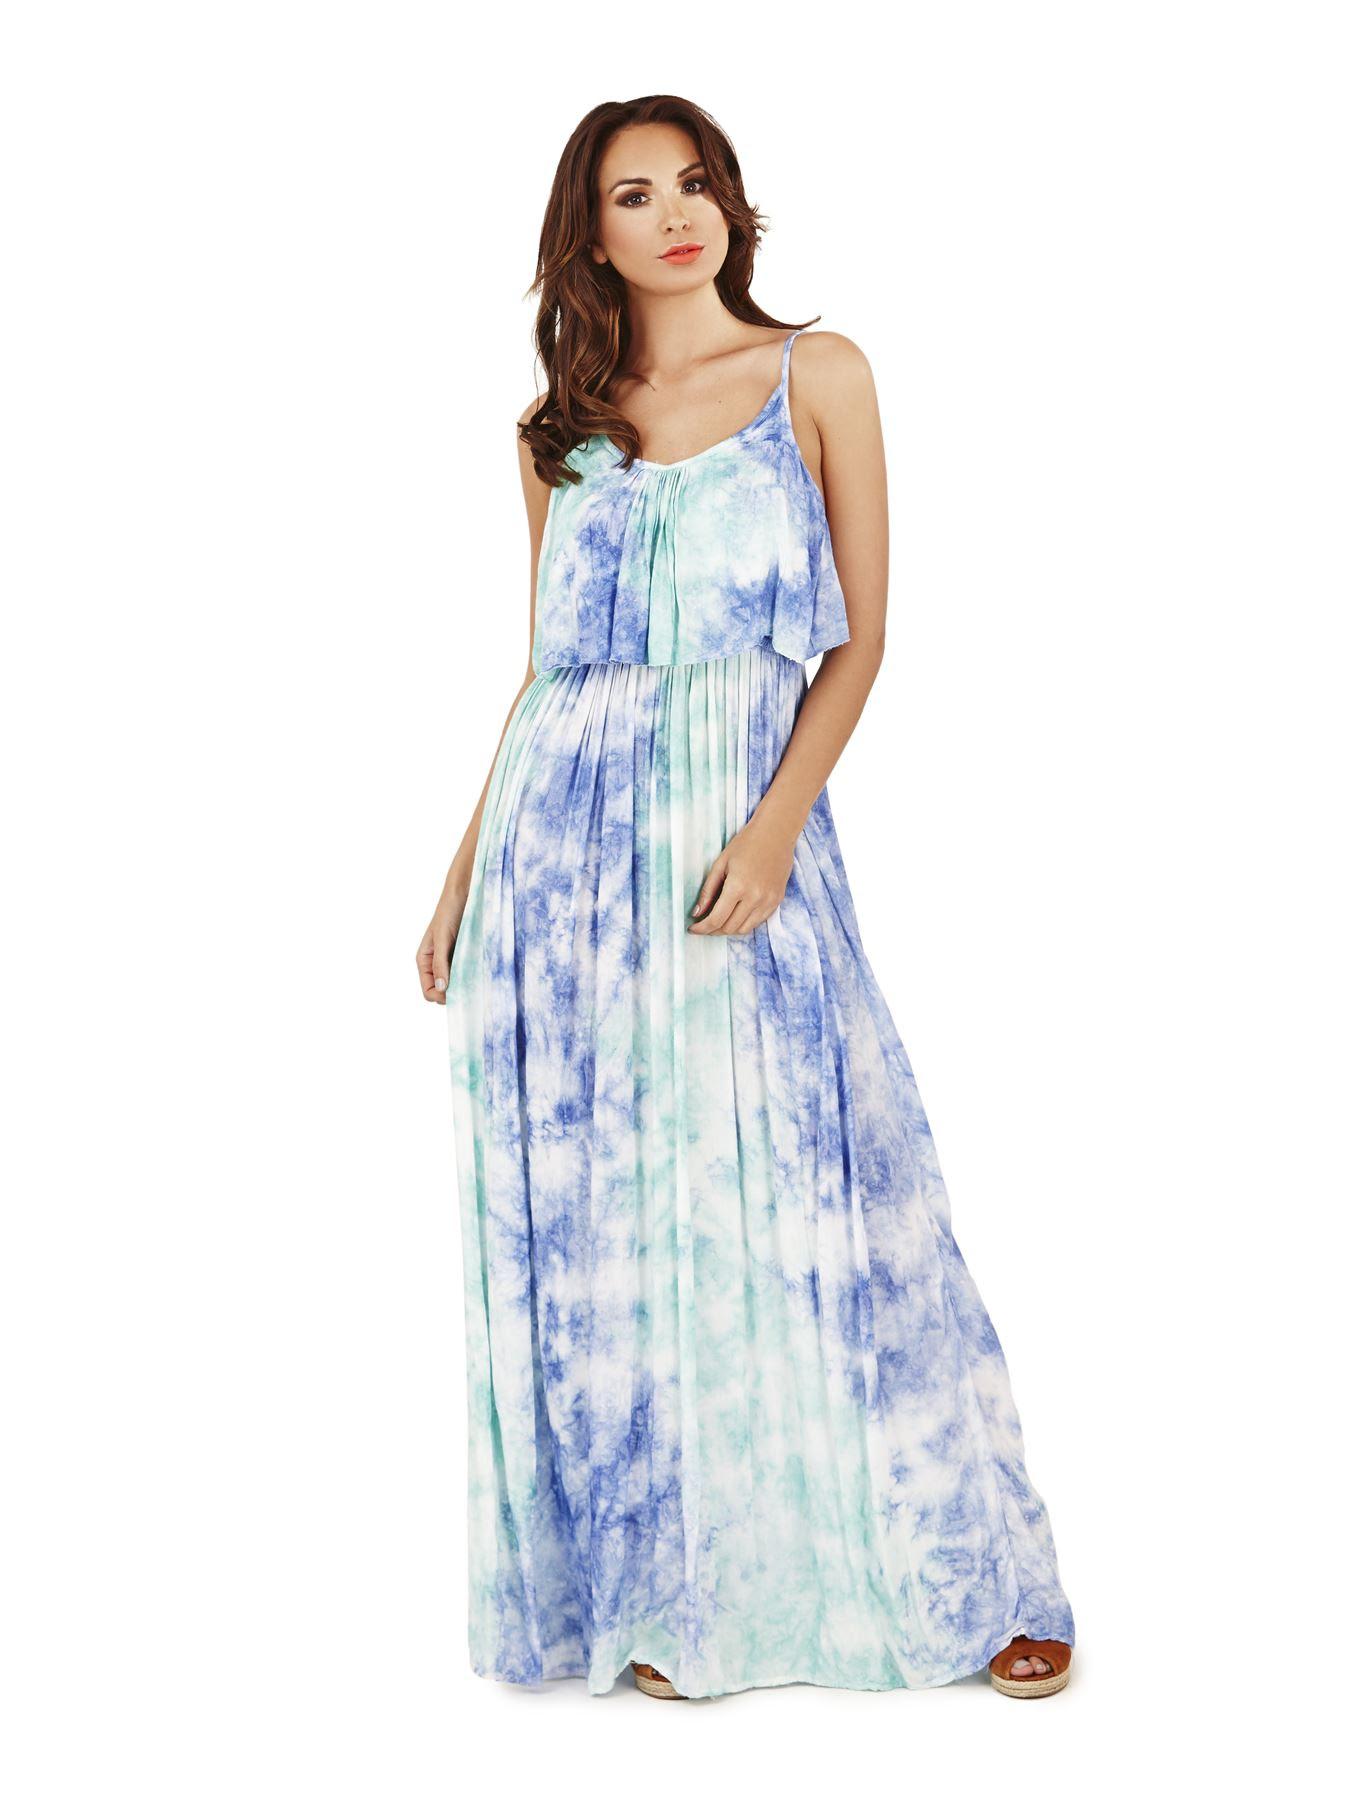 new 2017 womens ladies summer holiday beach sun tie dye